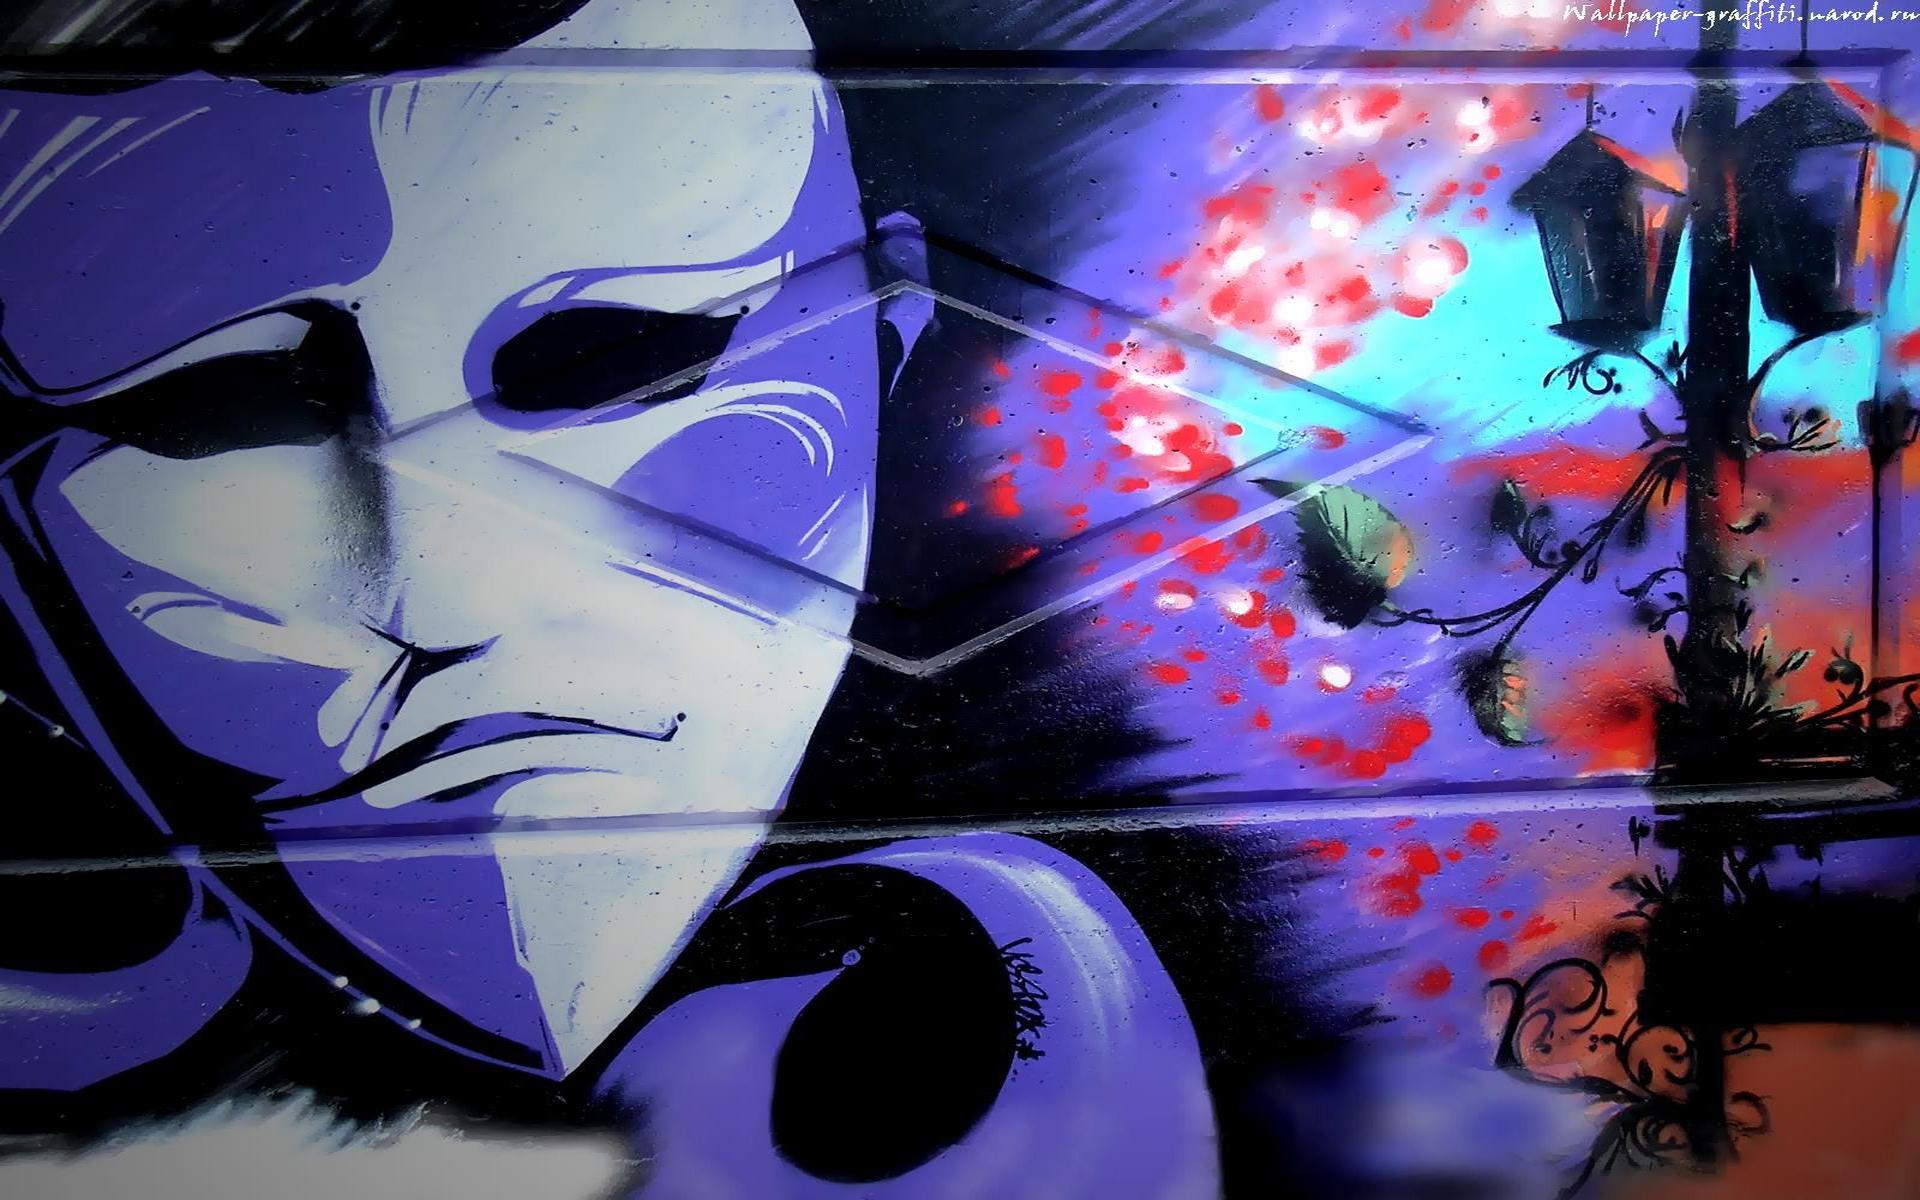 Graffiti Wallpapers Art Wallpaper Graffiti Wallpaper 1jpg 1920x1200 1920x1200